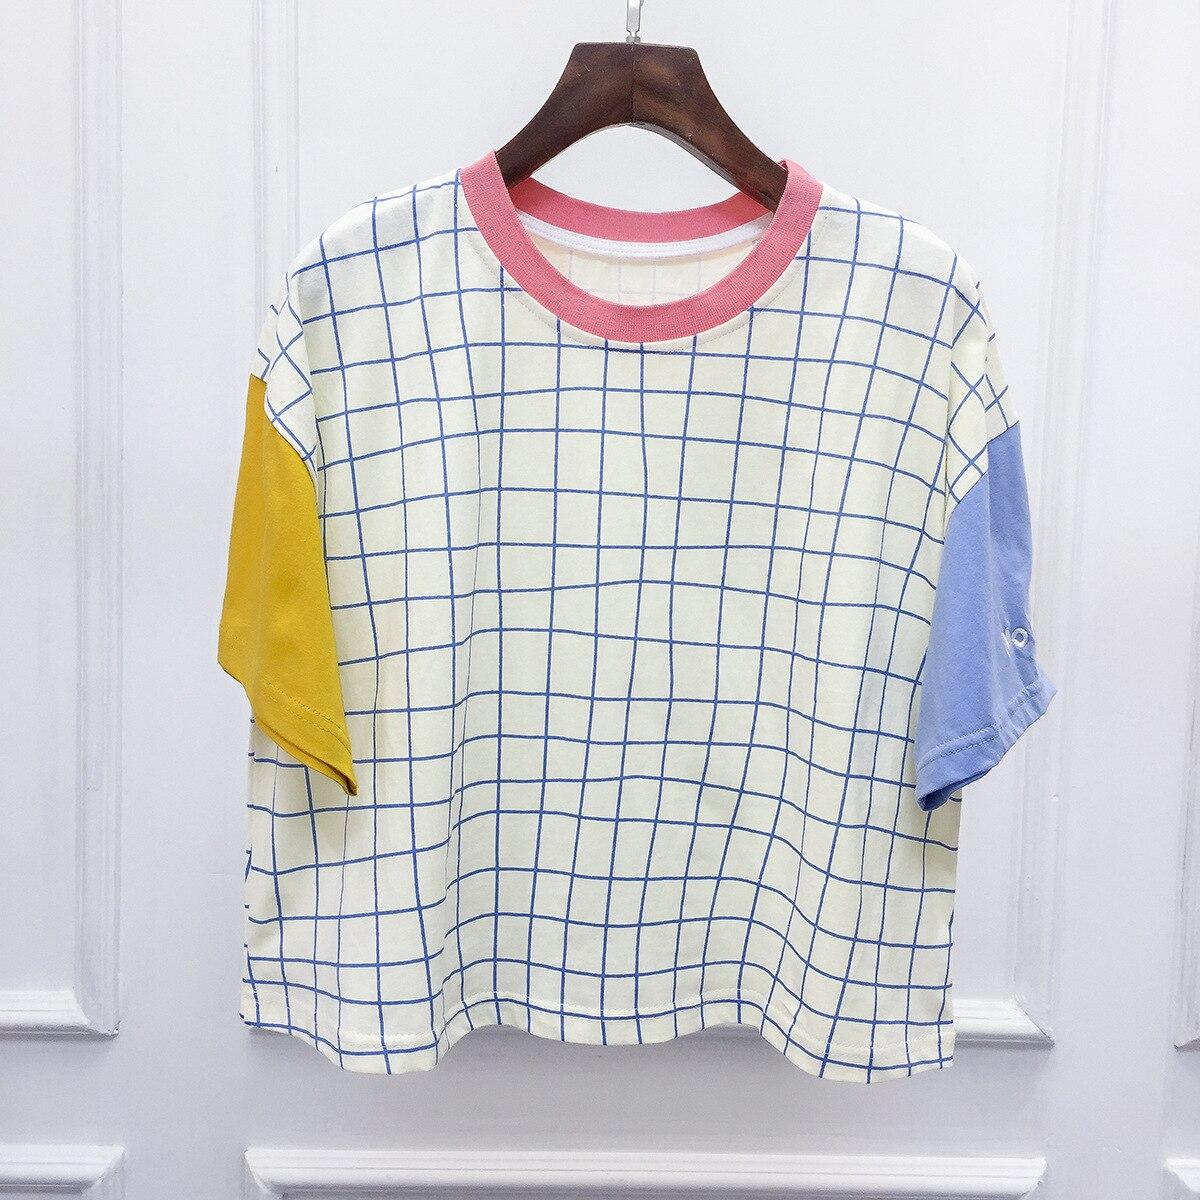 japanese-font-b-senna-b-font-plaid-letters-loose-bat-sleeve-short-sleeved-t-shirt-female-19279